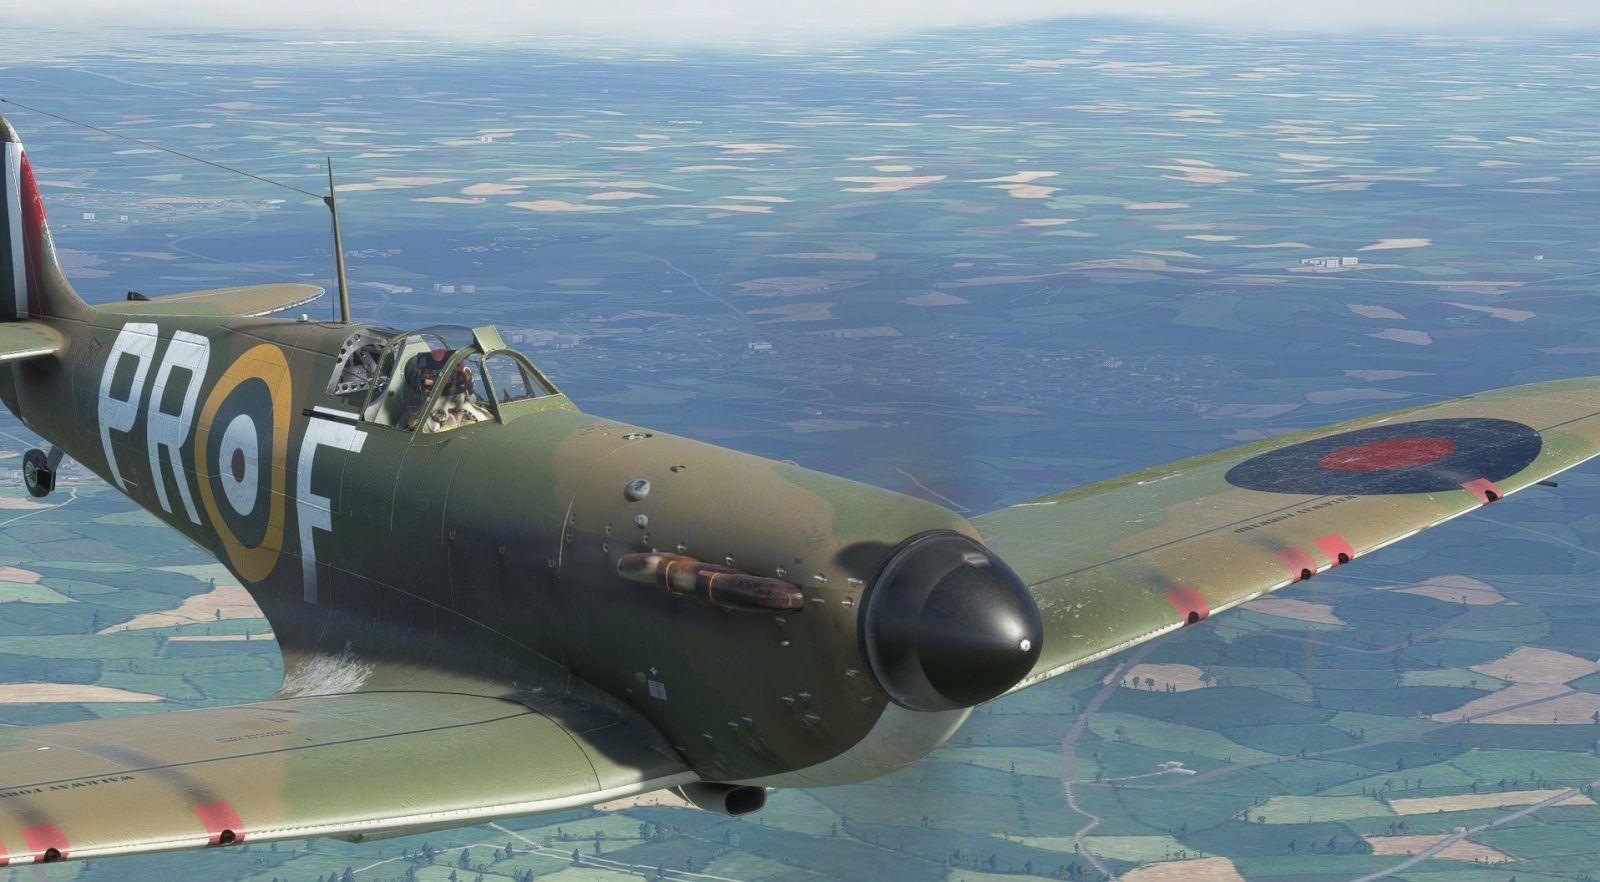 MSFS Supermarine Spitfire Mk1a